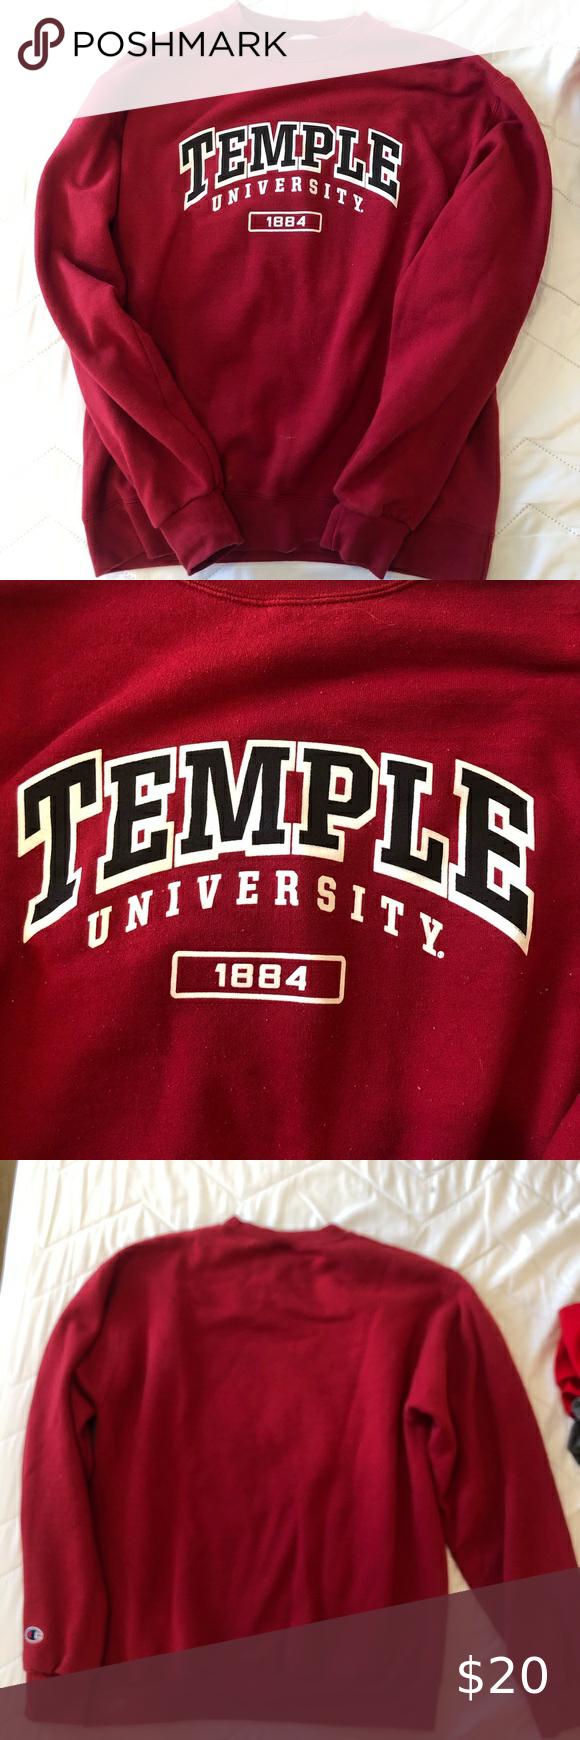 Temple Crewneck Crew Neck Sweaters For Women Women Shopping [ 1740 x 580 Pixel ]